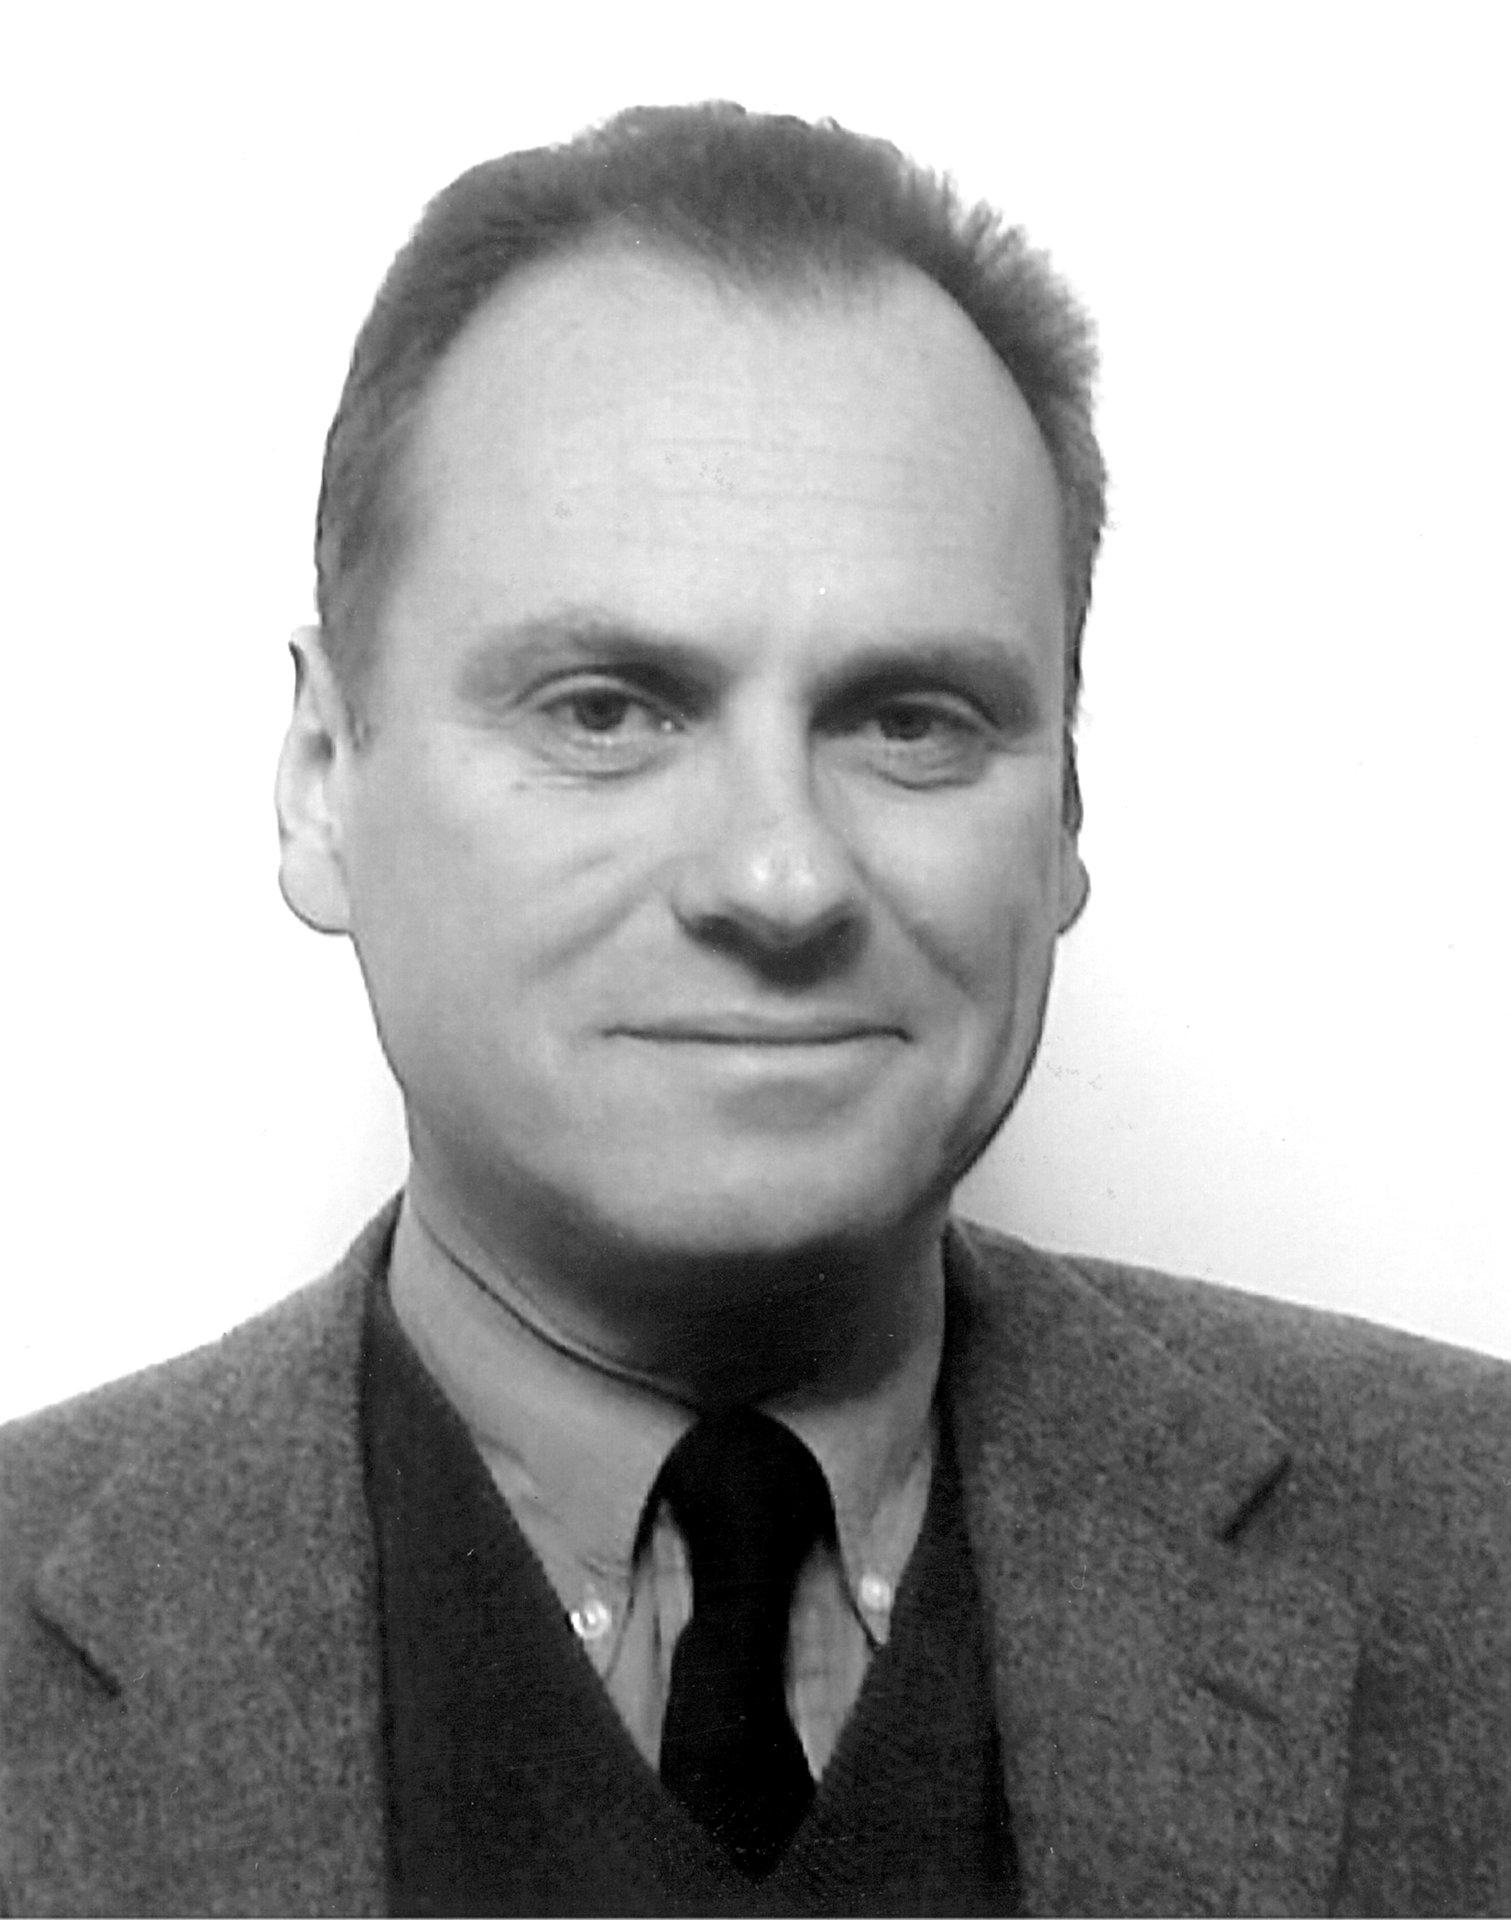 Humbert Balsan salary